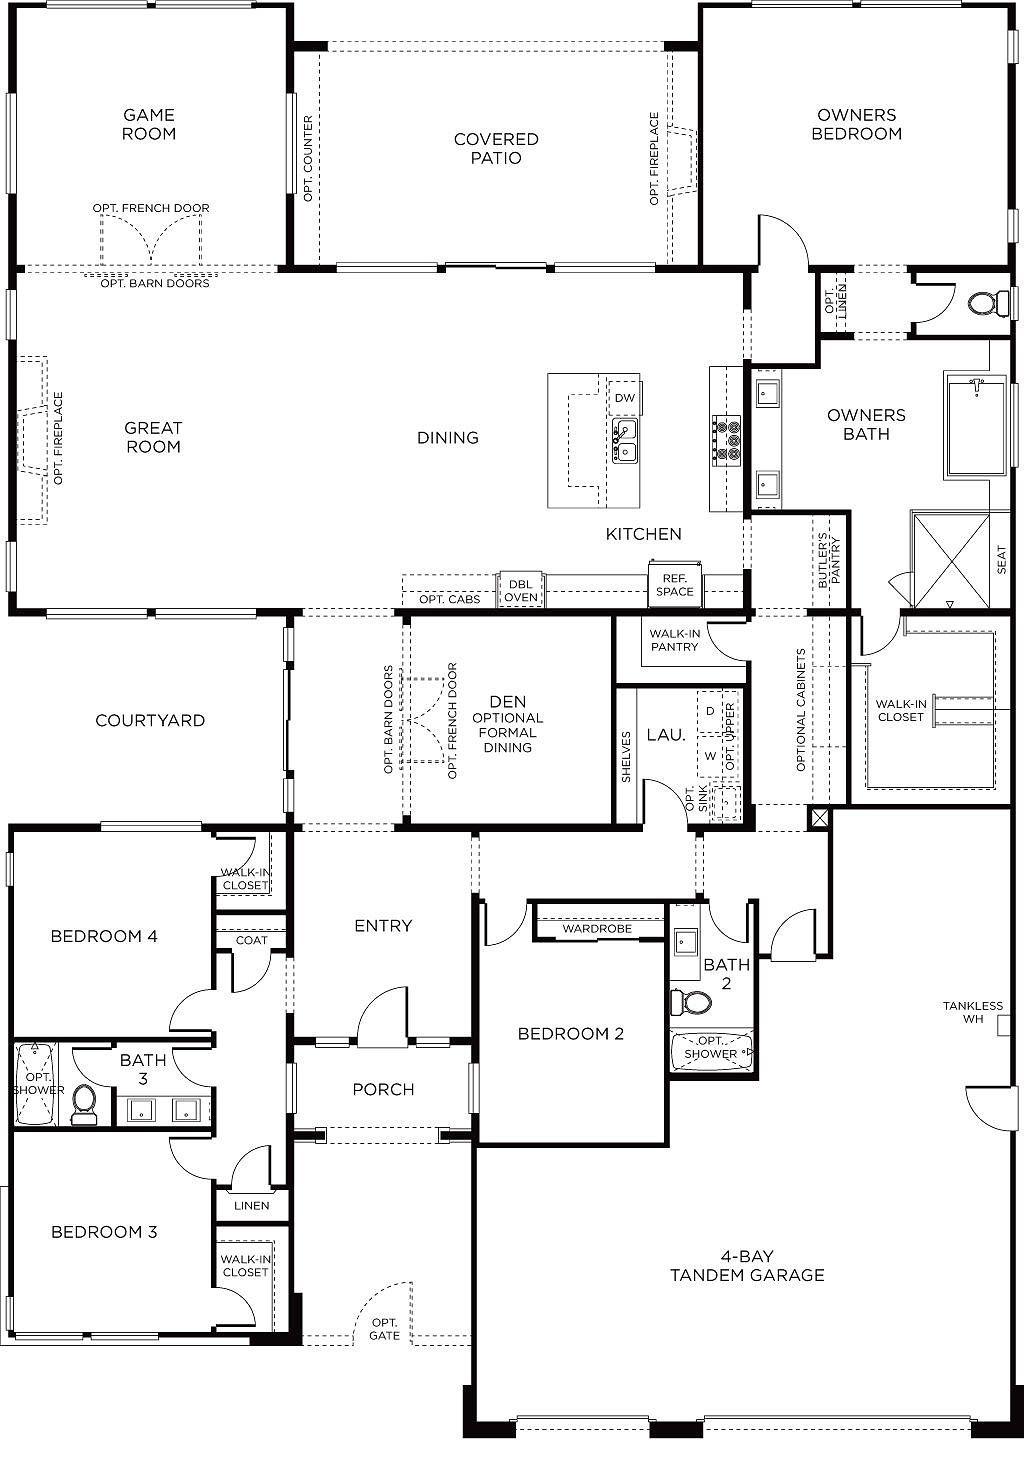 Plan 2 Pardee Homes Single Story House Floor Plans Garage Floor Plans New House Plans